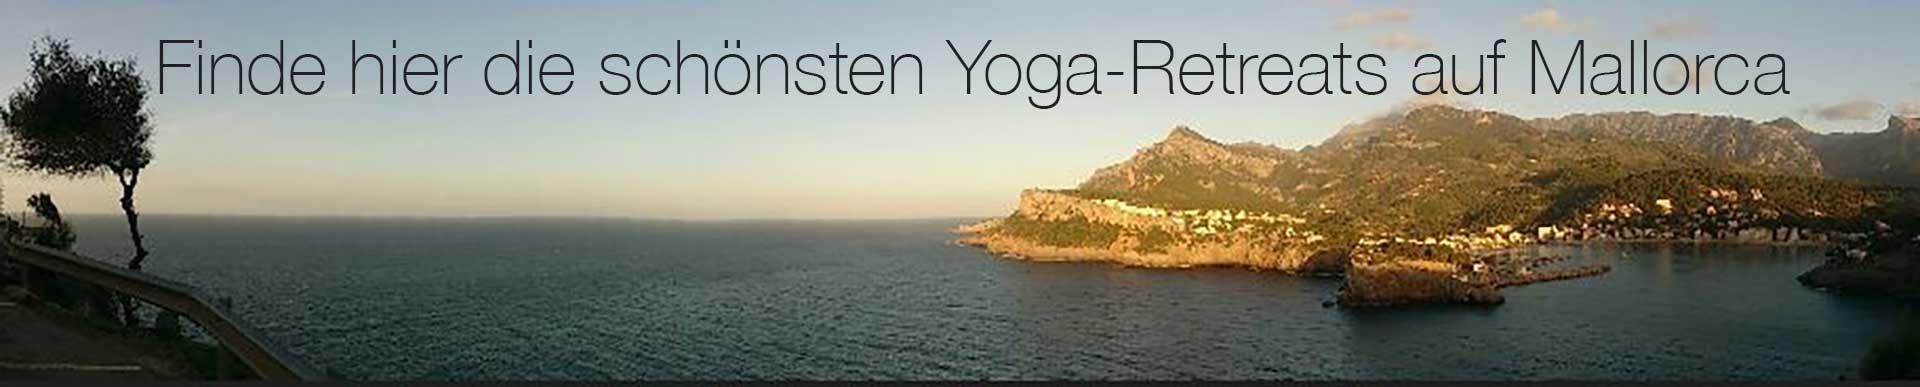 Yoga retreats auf Mallorca buchen